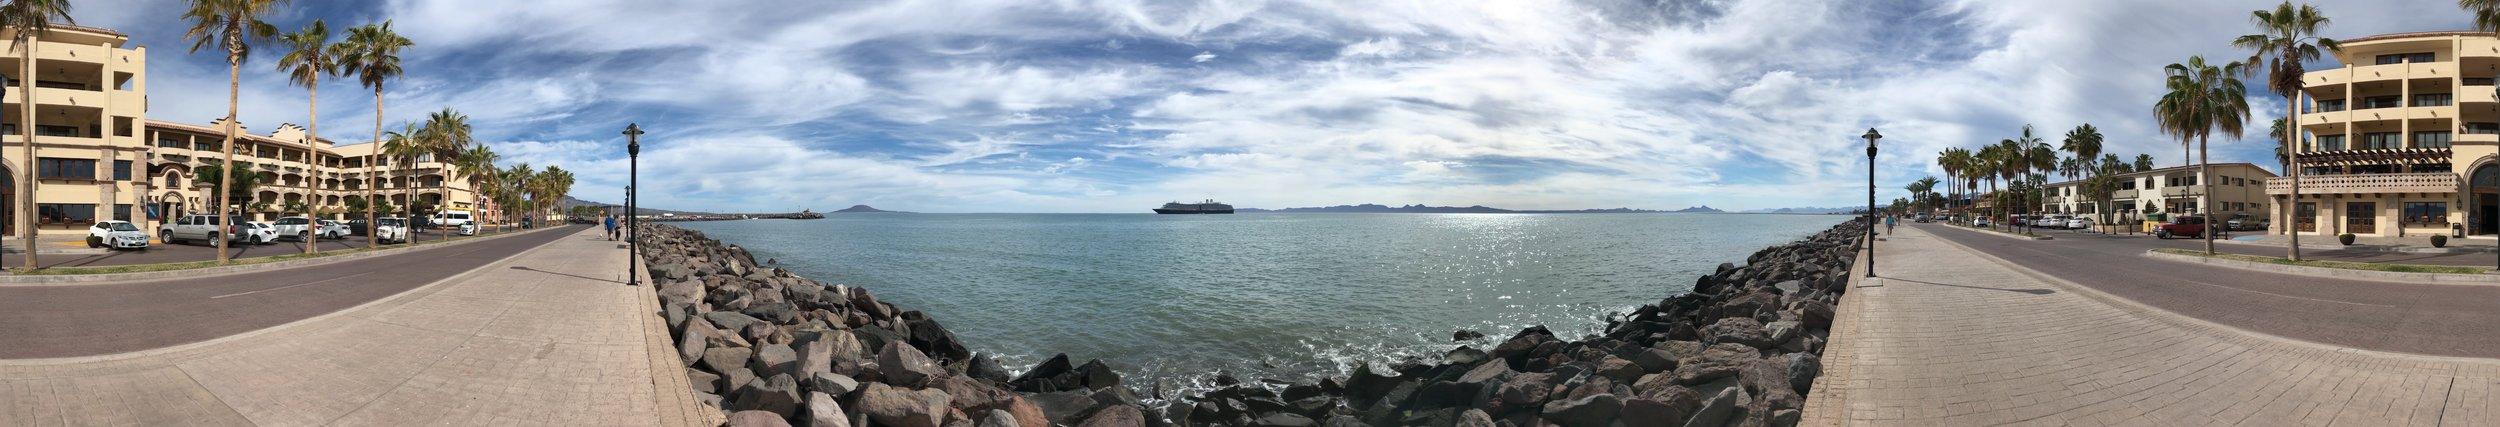 180 Degress of Loreto Beach